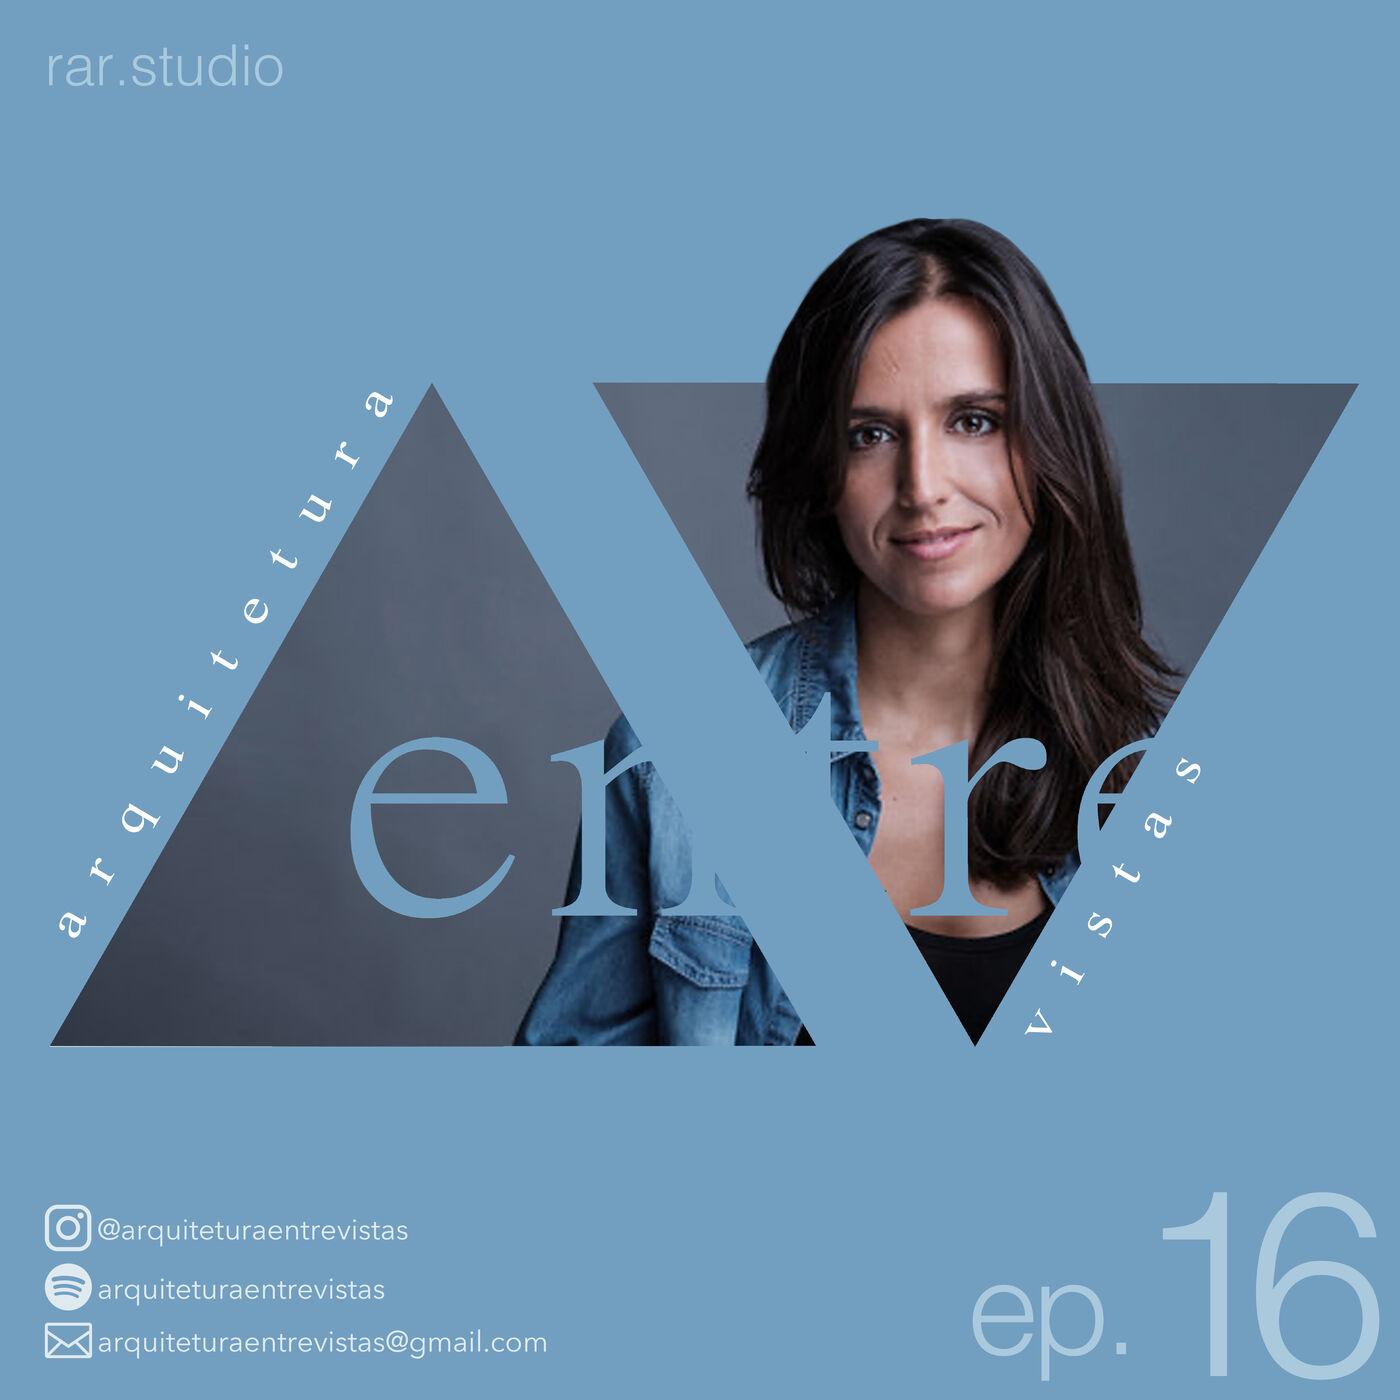 EP.16 rar.studio, Arquitetura Entre Vistas